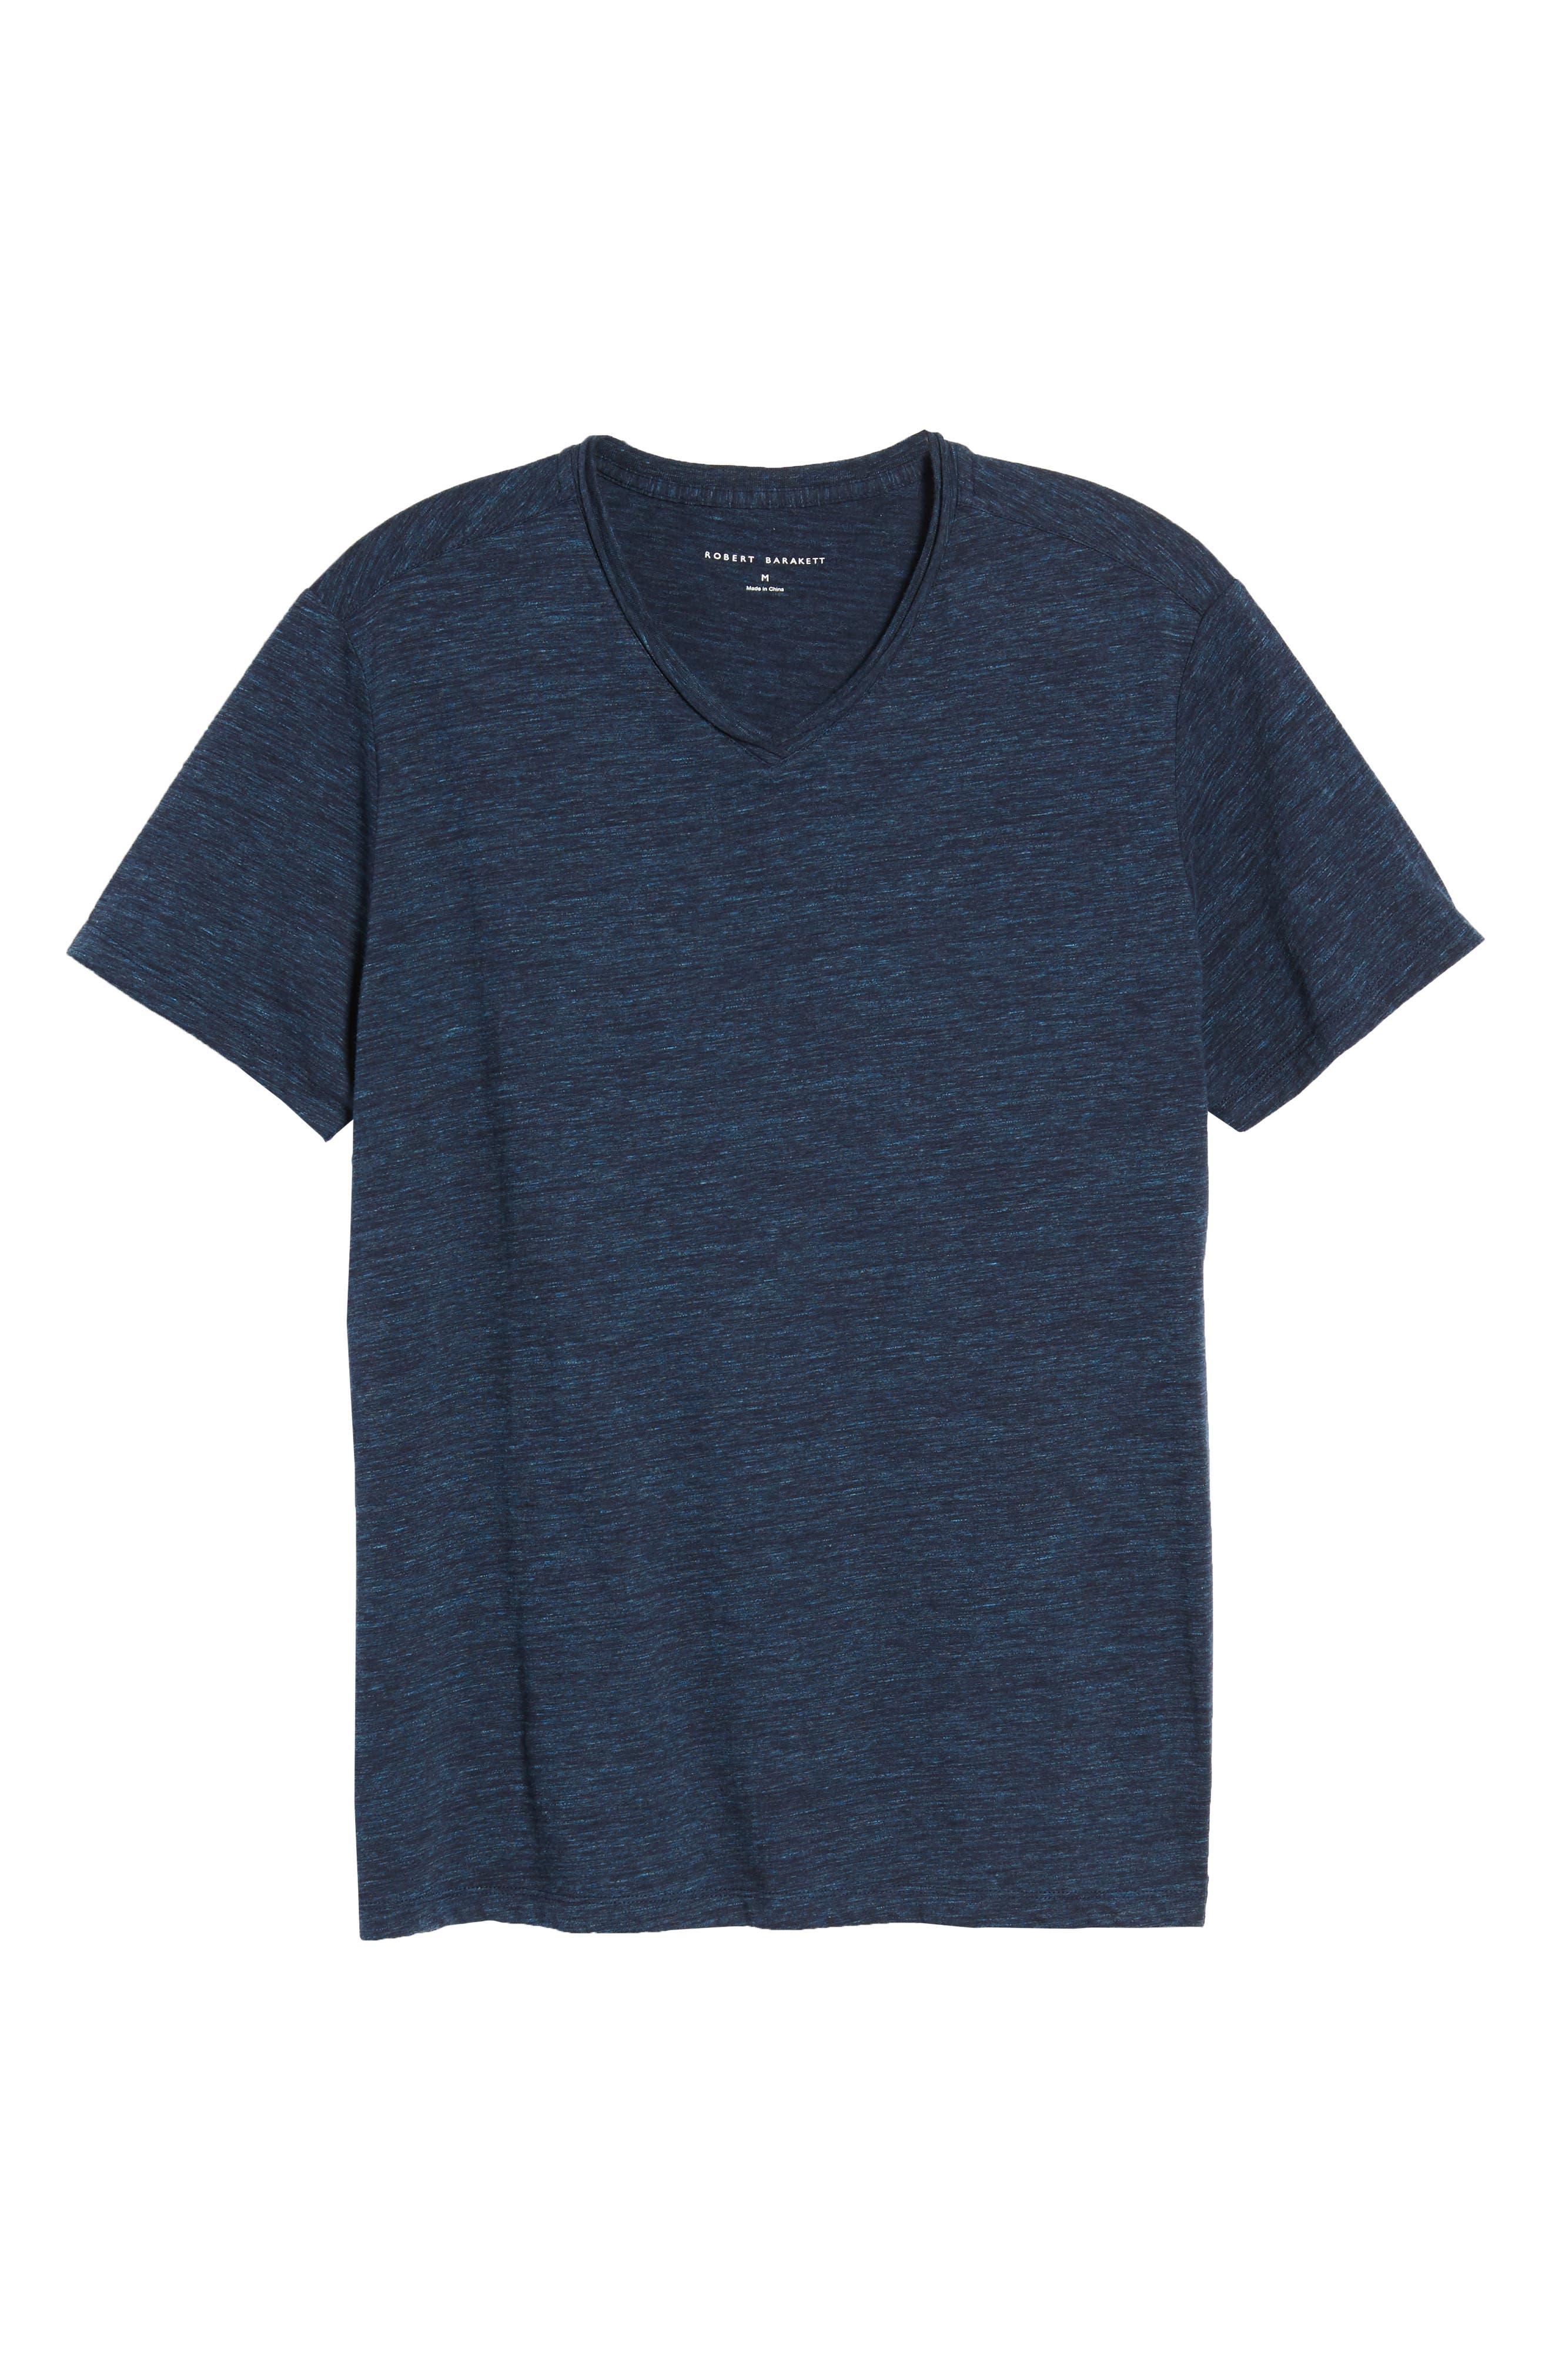 John Smith T-Shirt,                             Alternate thumbnail 6, color,                             Navy